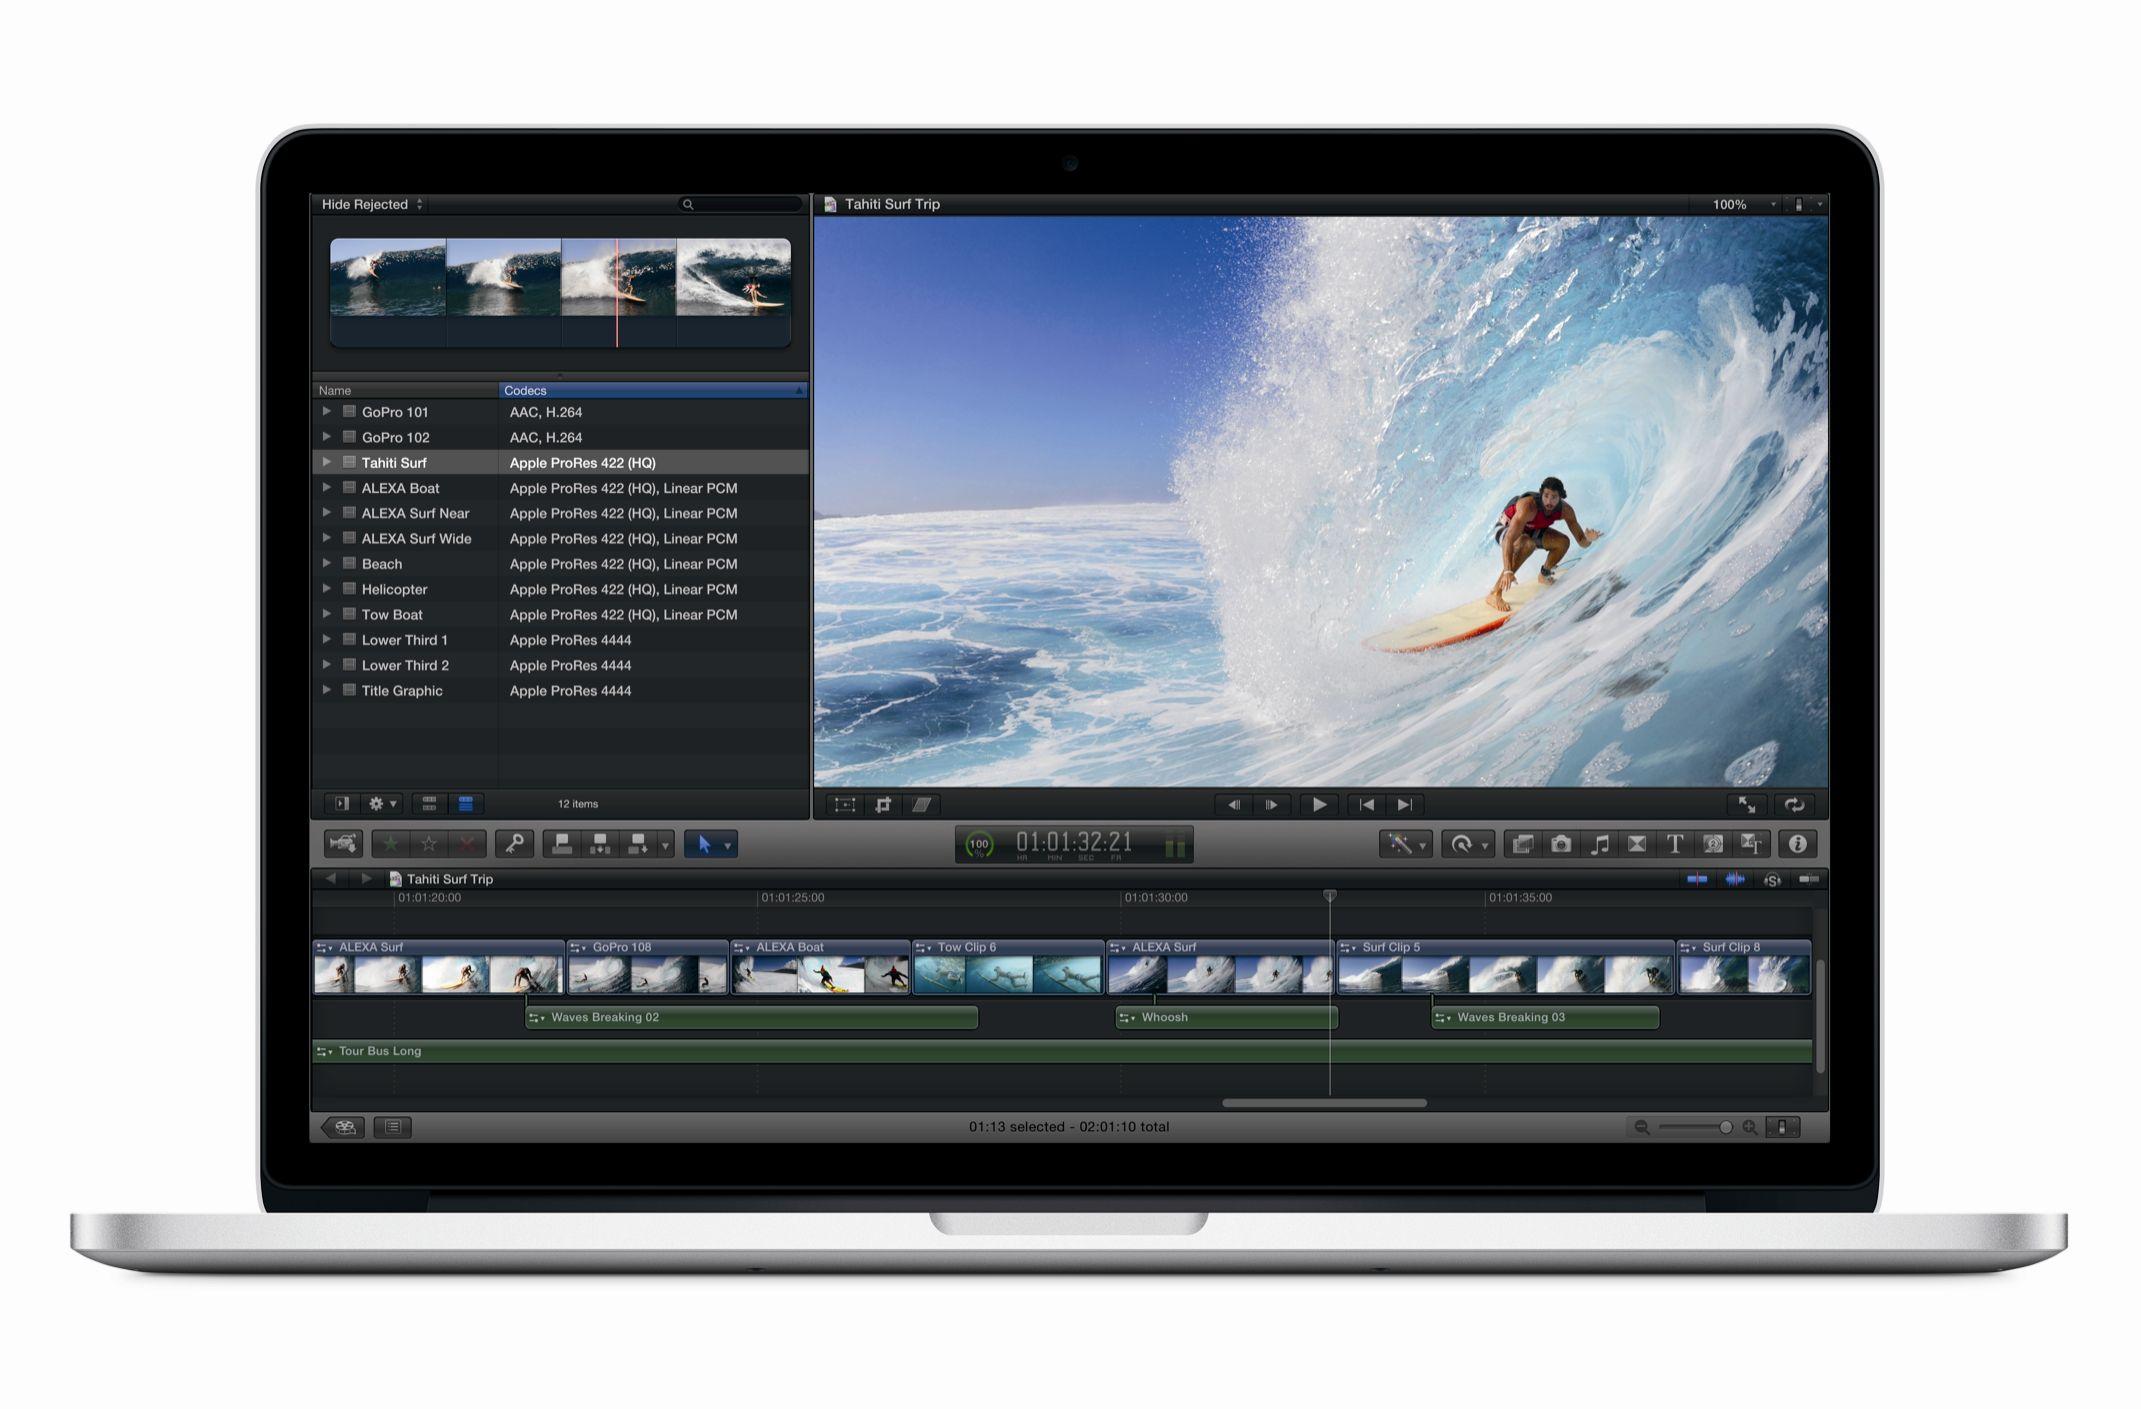 3f39e417a249 Refurbished Apple A Grade Macbook Pro 15.4-inch Laptop (Retina) 2.7Ghz Quad  Core i7 (Mid 2012) MD831LL/A 512 GB SSD 16 GB Memory 2880x1800 Display ...